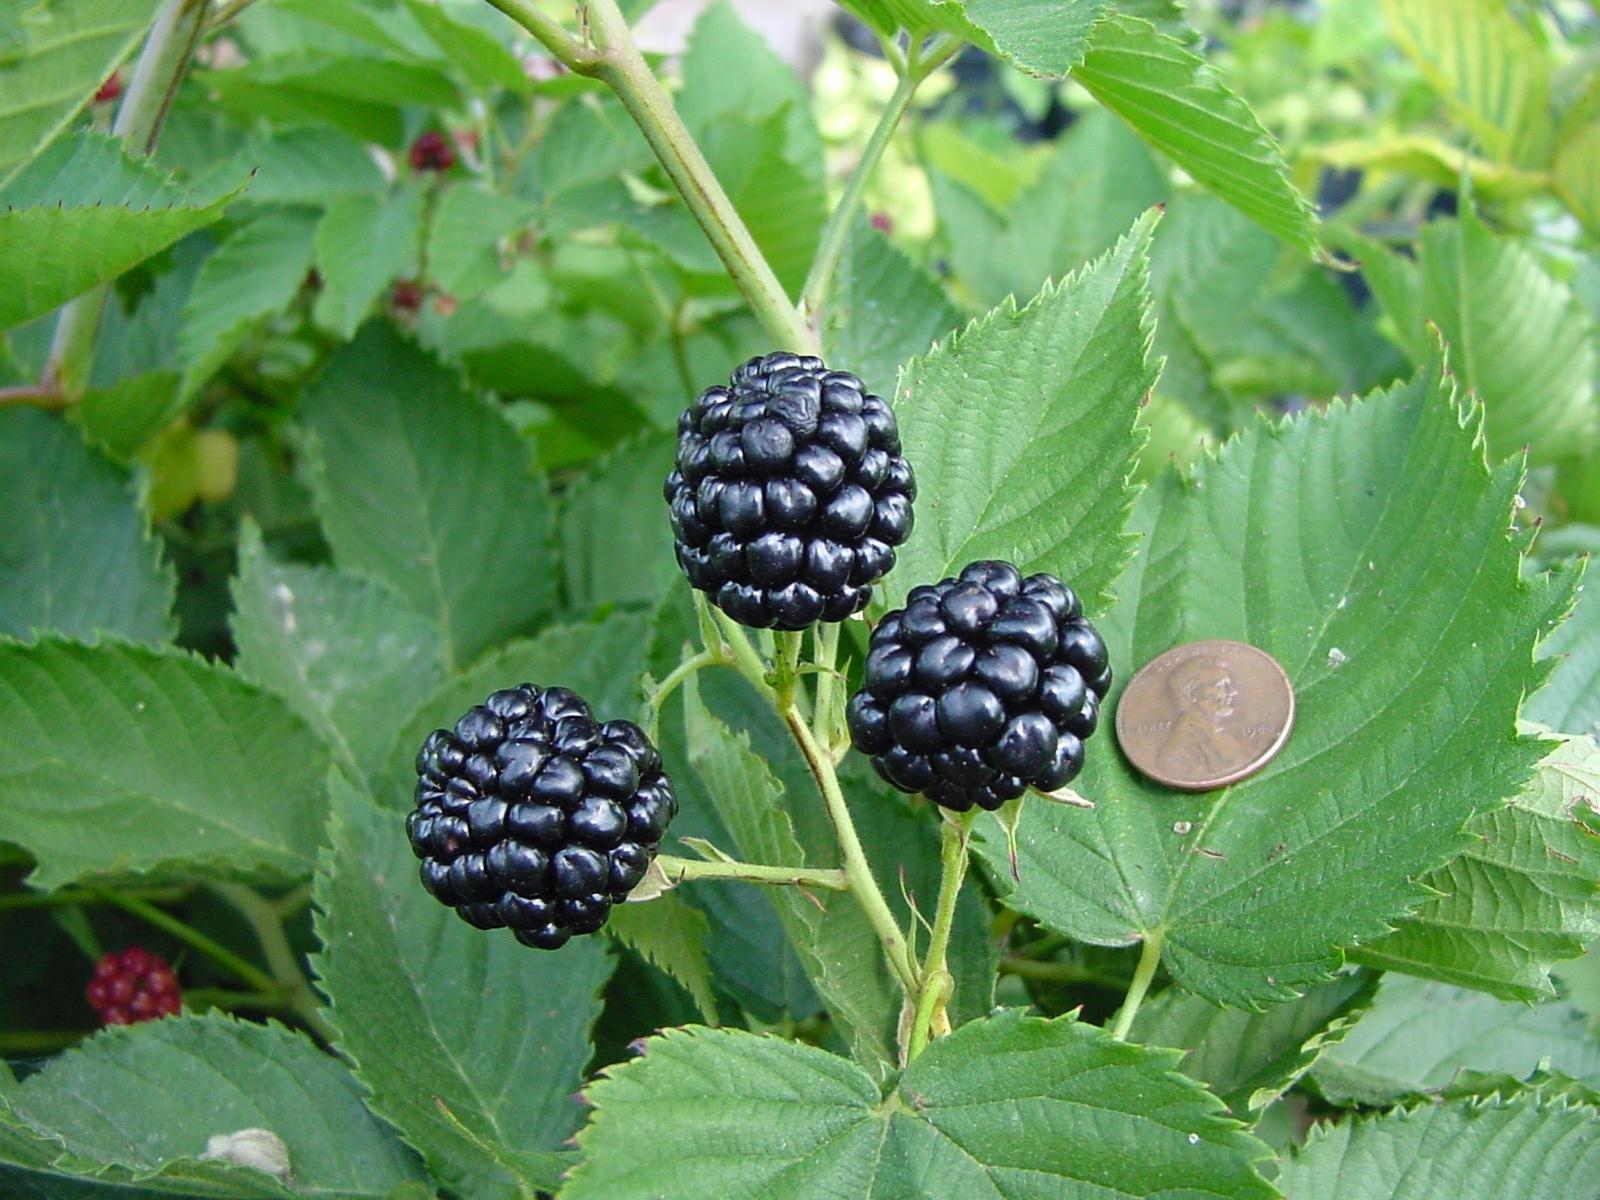 3 Starter Plants of Natchez BlackBerry Bush Live Plant New Rubus by Andryani (Image #1)